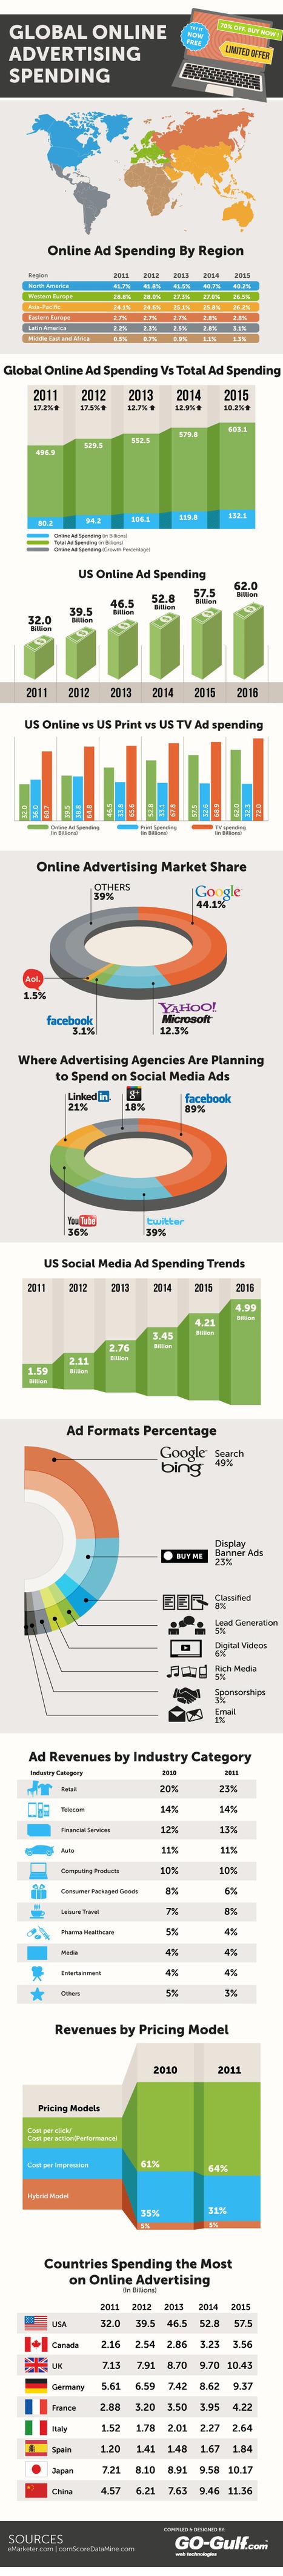 Global Online Advertising Spending Statistics [Infographic] | Marketing & Webmarketing | Scoop.it